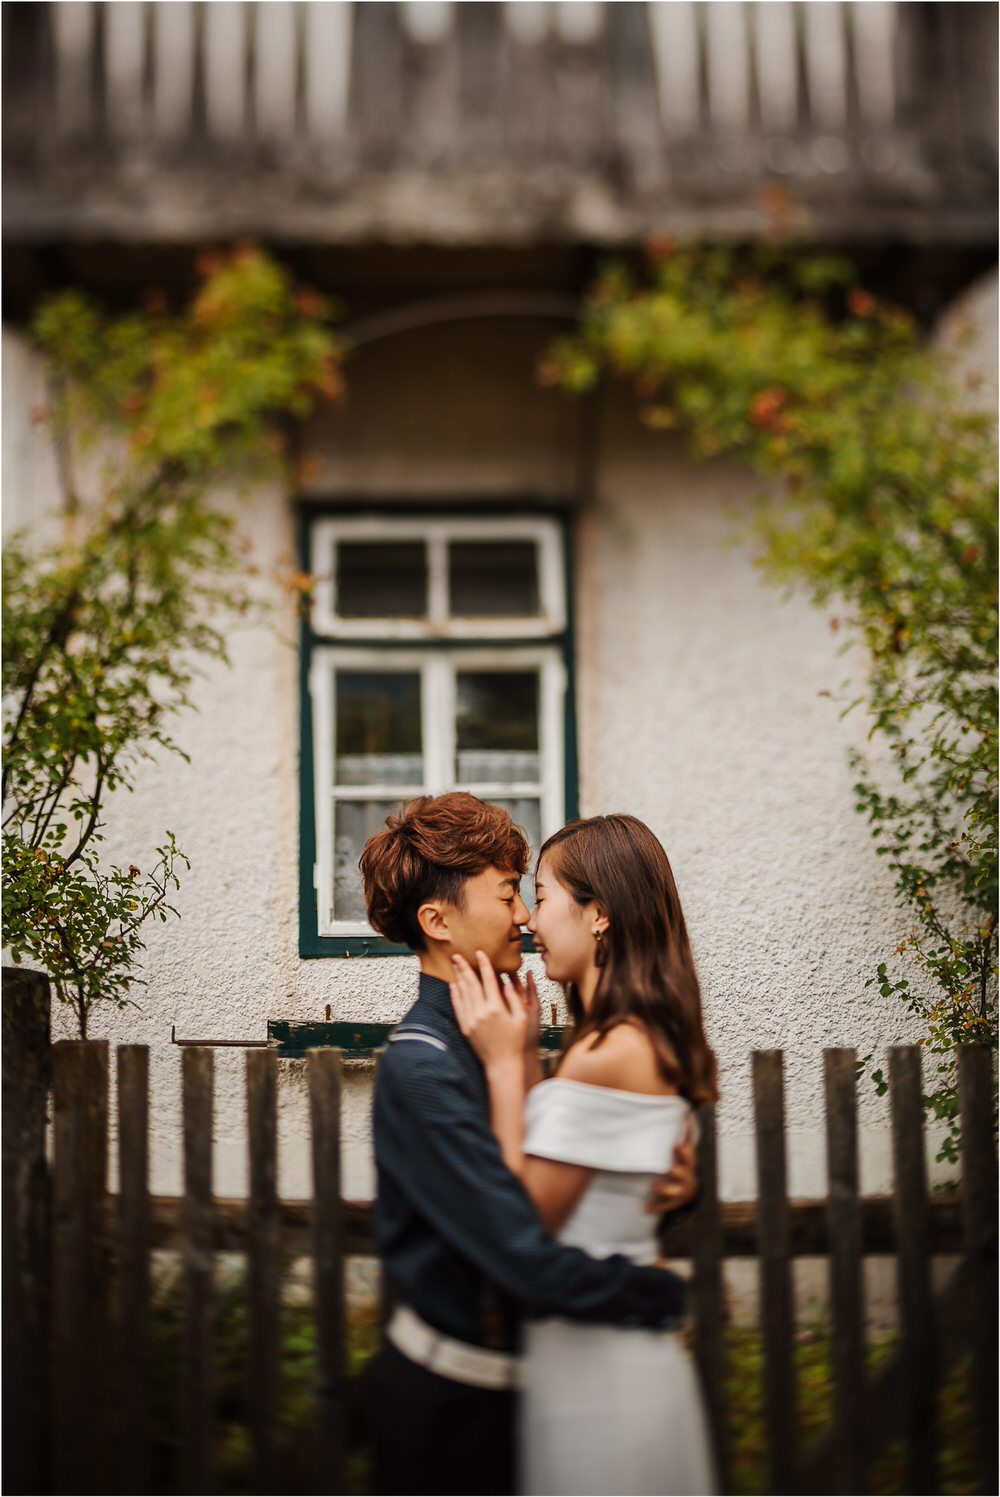 hallstatt austria wedding engagement photographer asian proposal surprise photography recommended nature professional 0042.jpg